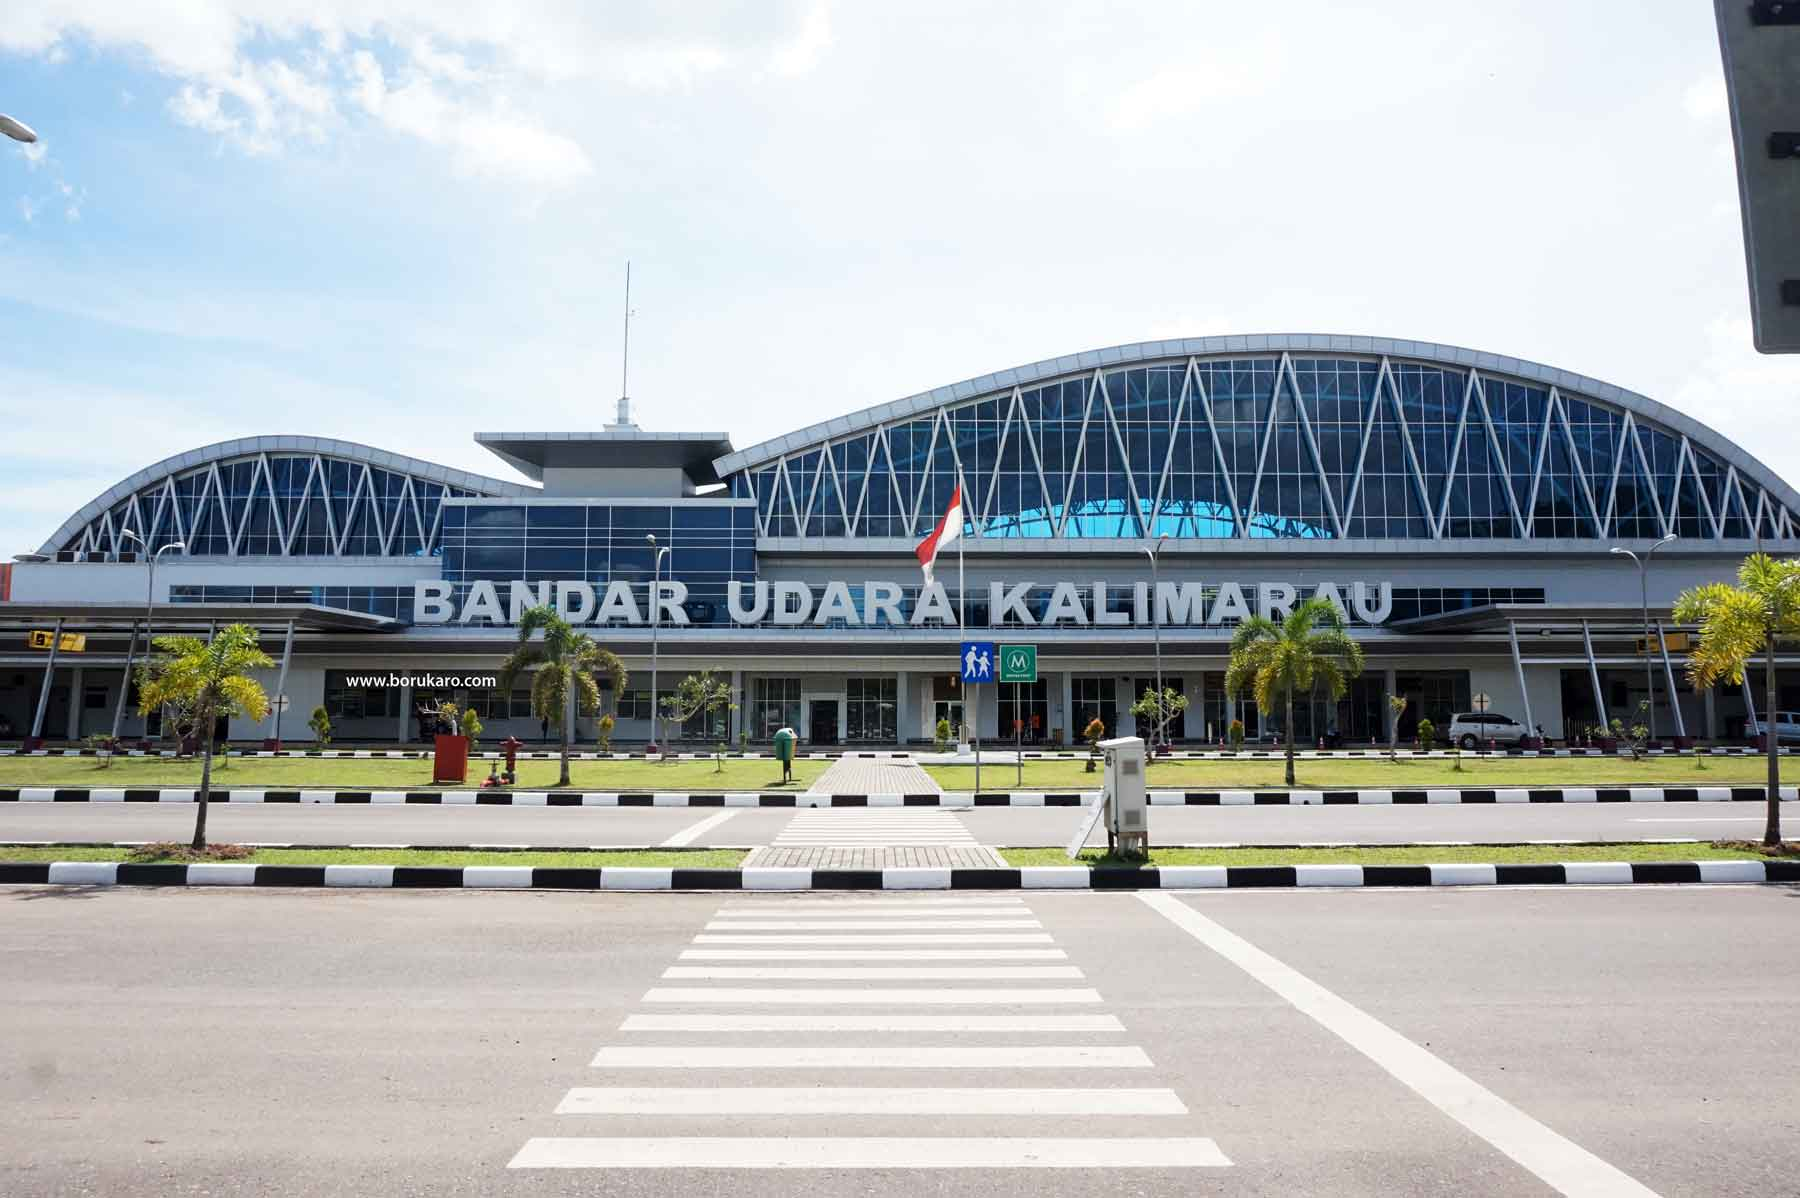 Bandar Udara Kalimarau